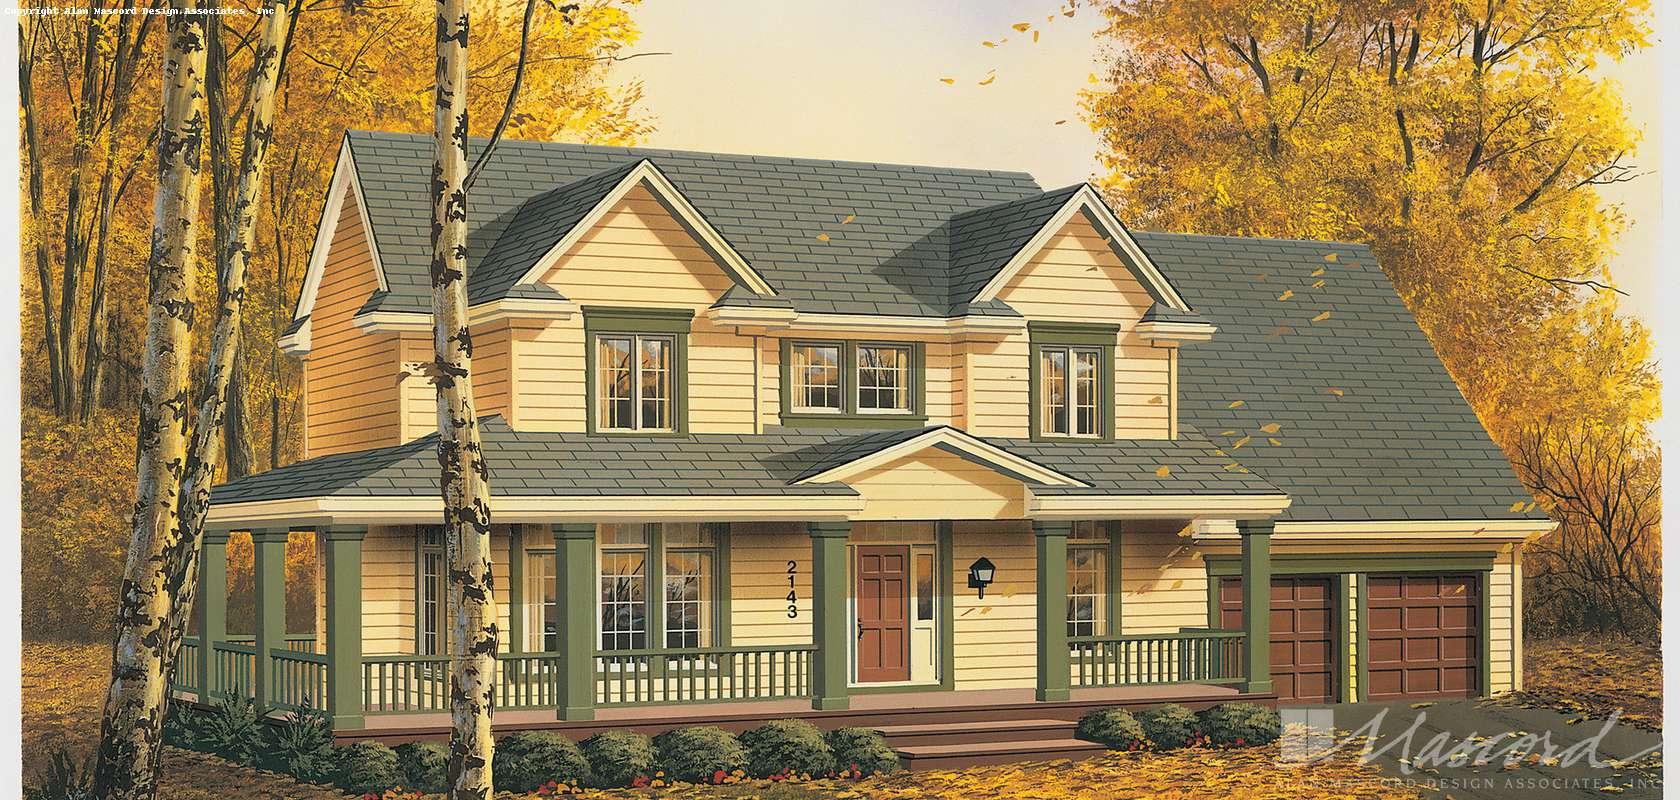 Mascord House Plan 2143: The Wilmington